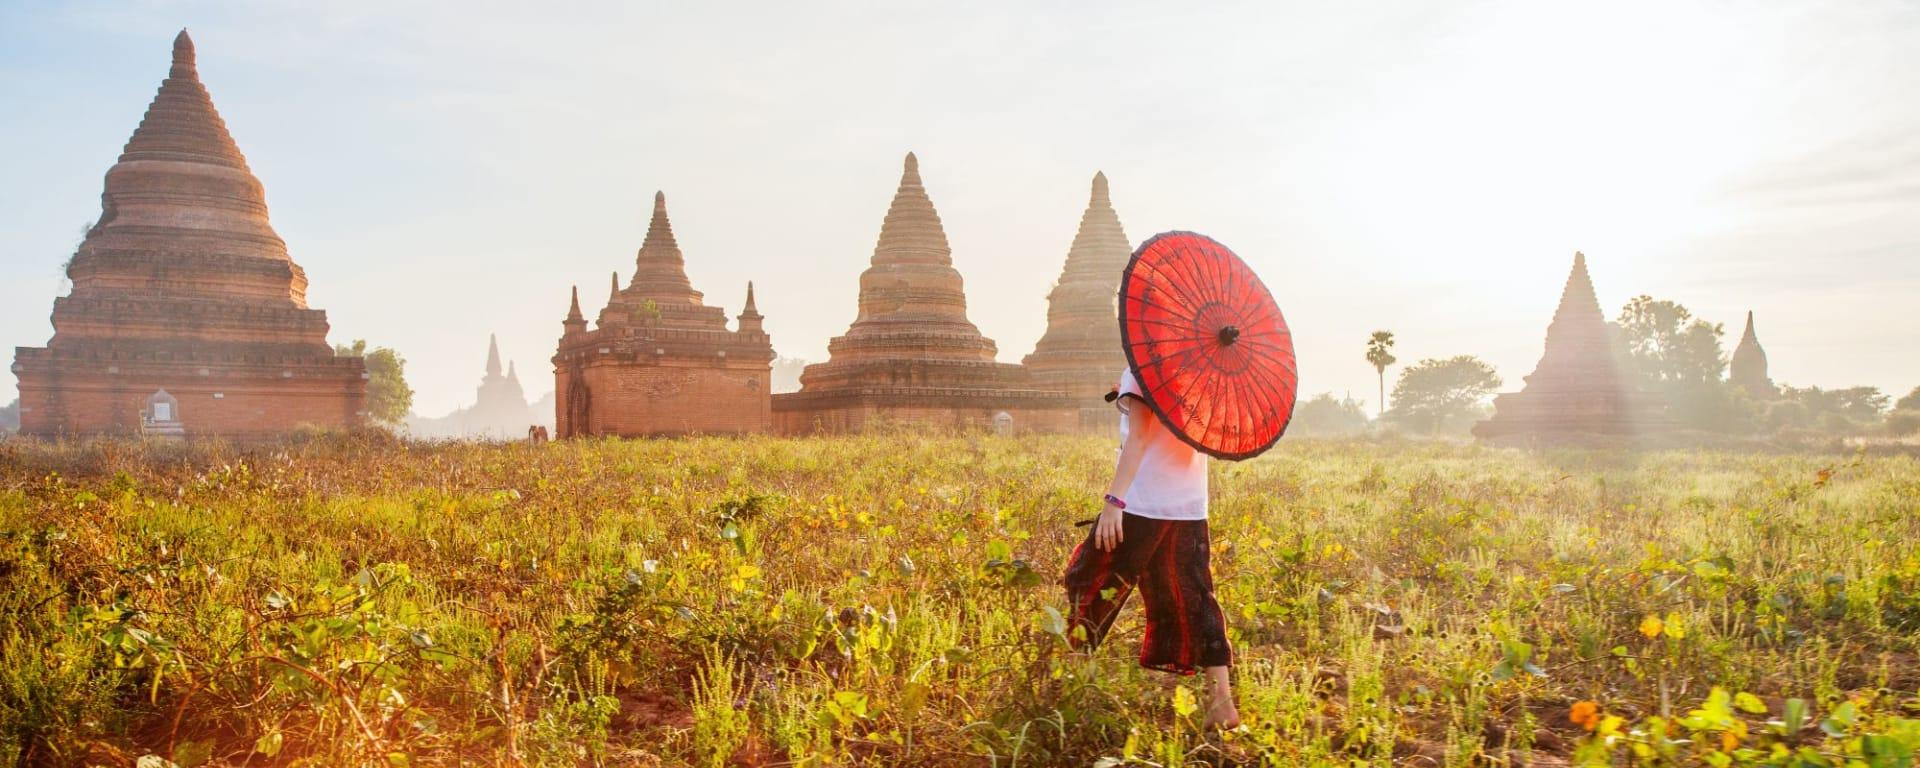 Faszination Myanmar - Ein Land im Wandel ab Yangon: Bagan Young girl with traditional burmese parasol